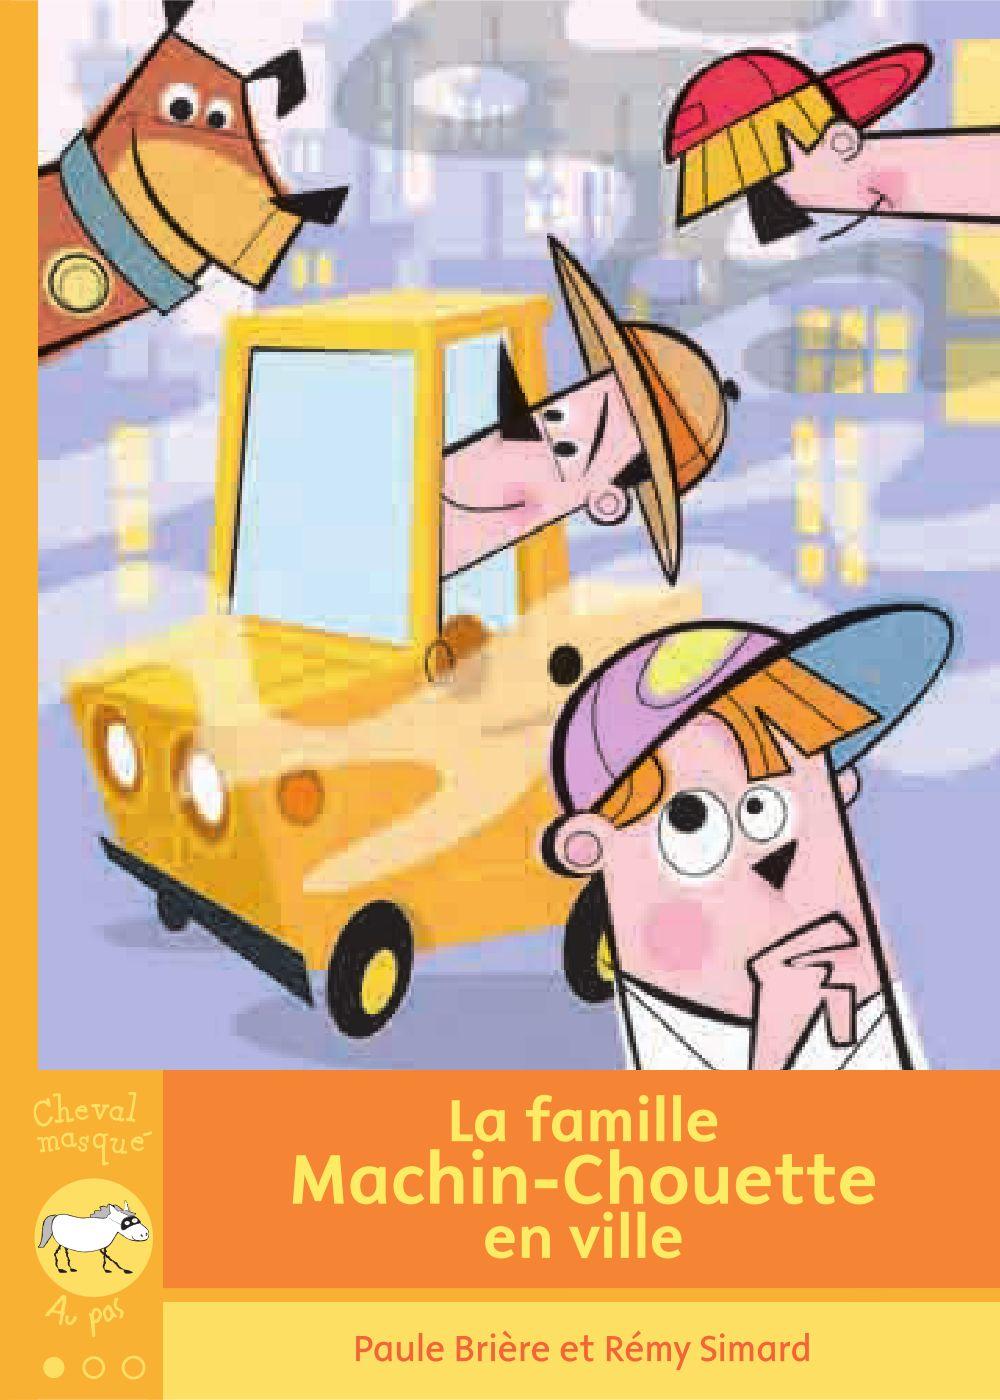 La famille Machin-Chouette en ville